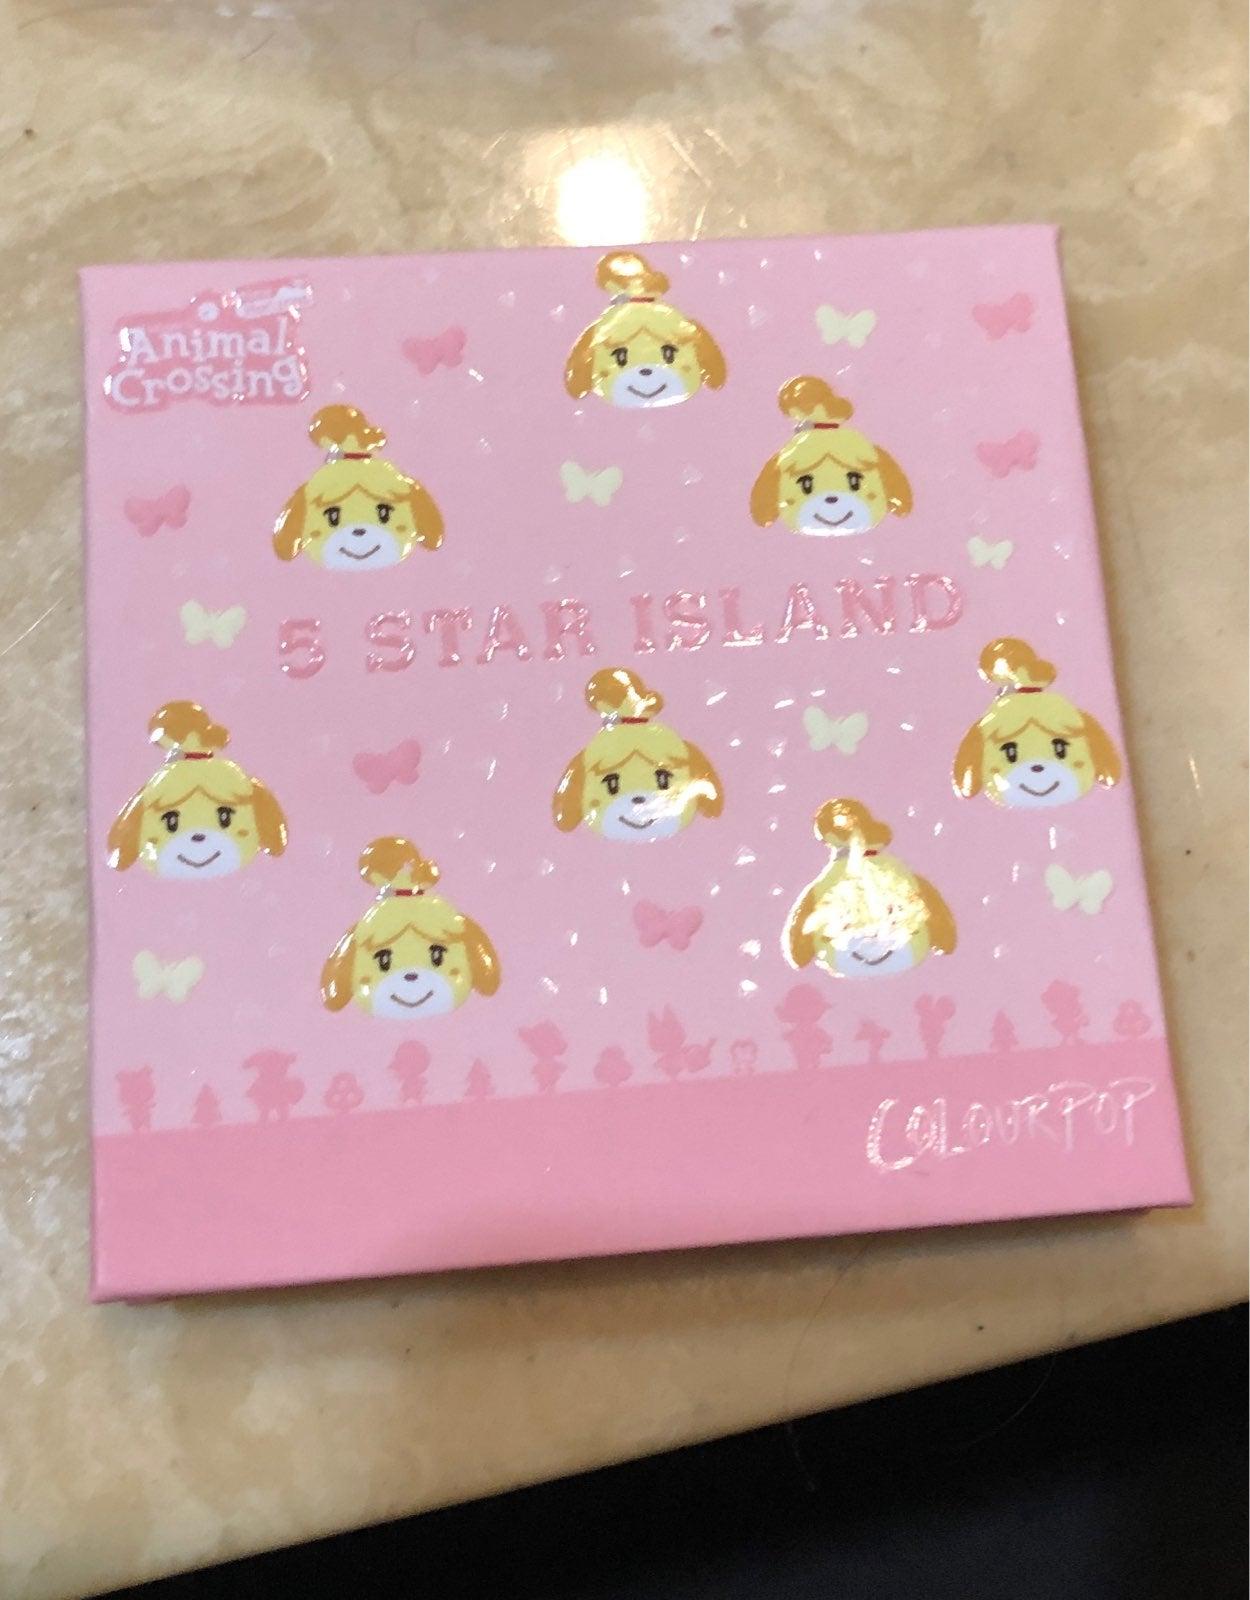 ColourPop Animal Crossing 5 Star Island